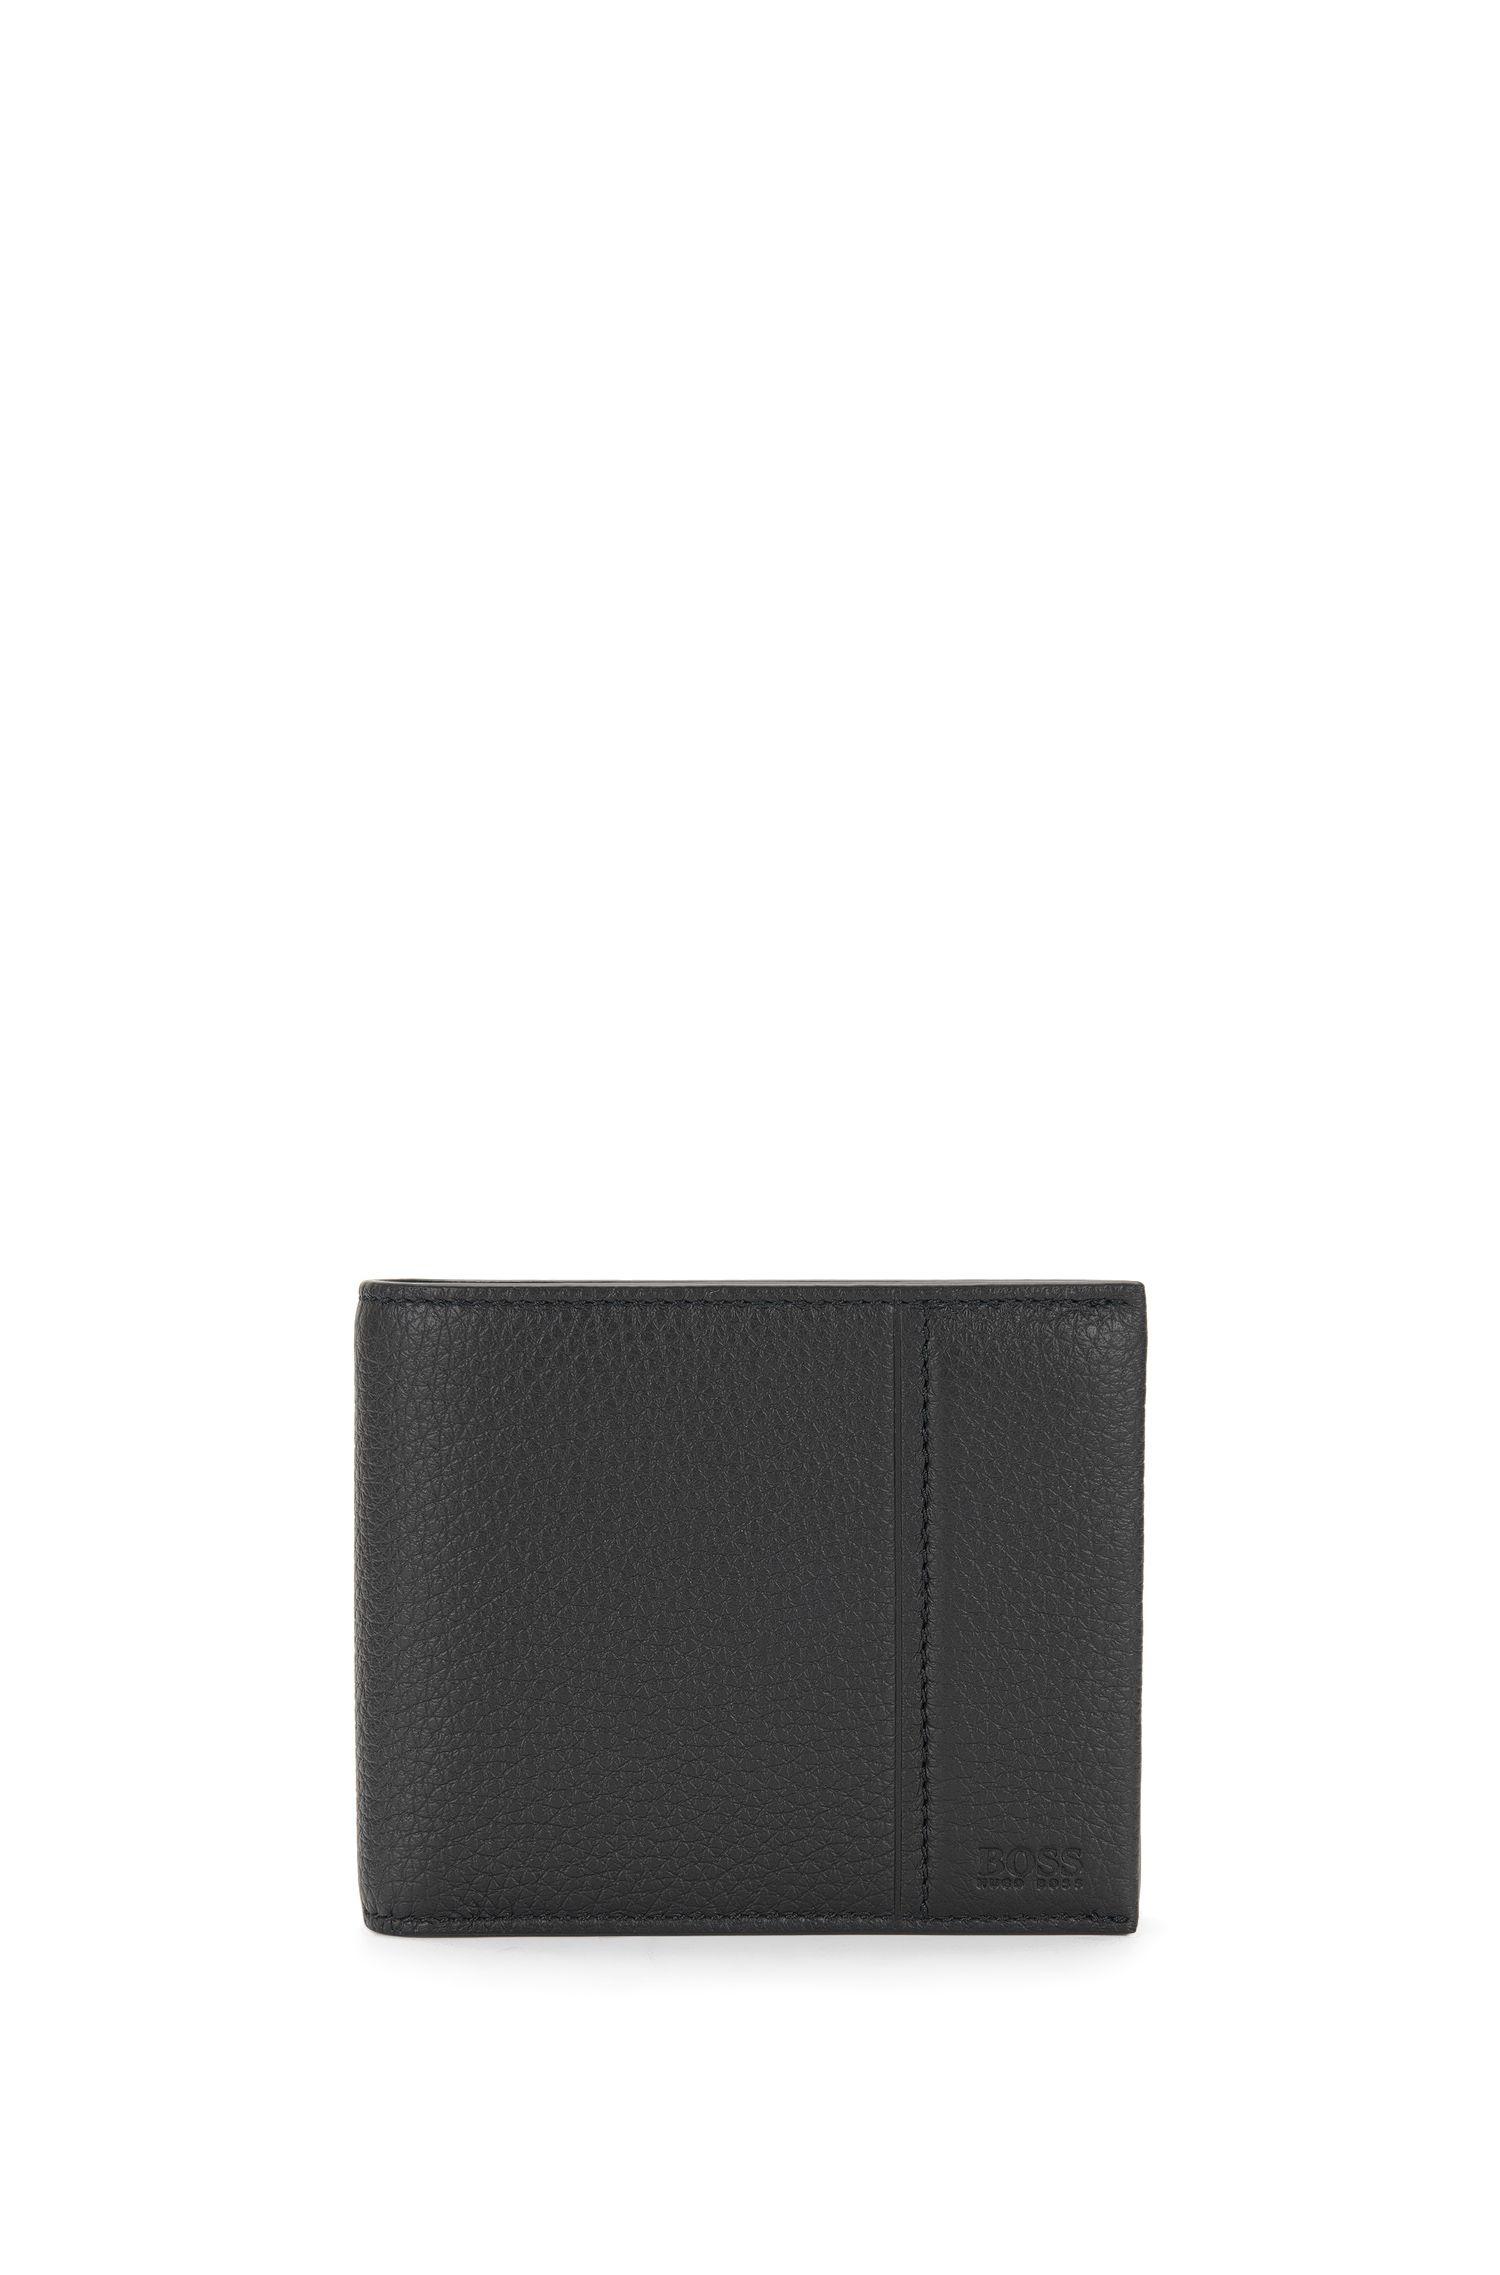 Openklapbare portemonnee van generfd rundleer van BOSS